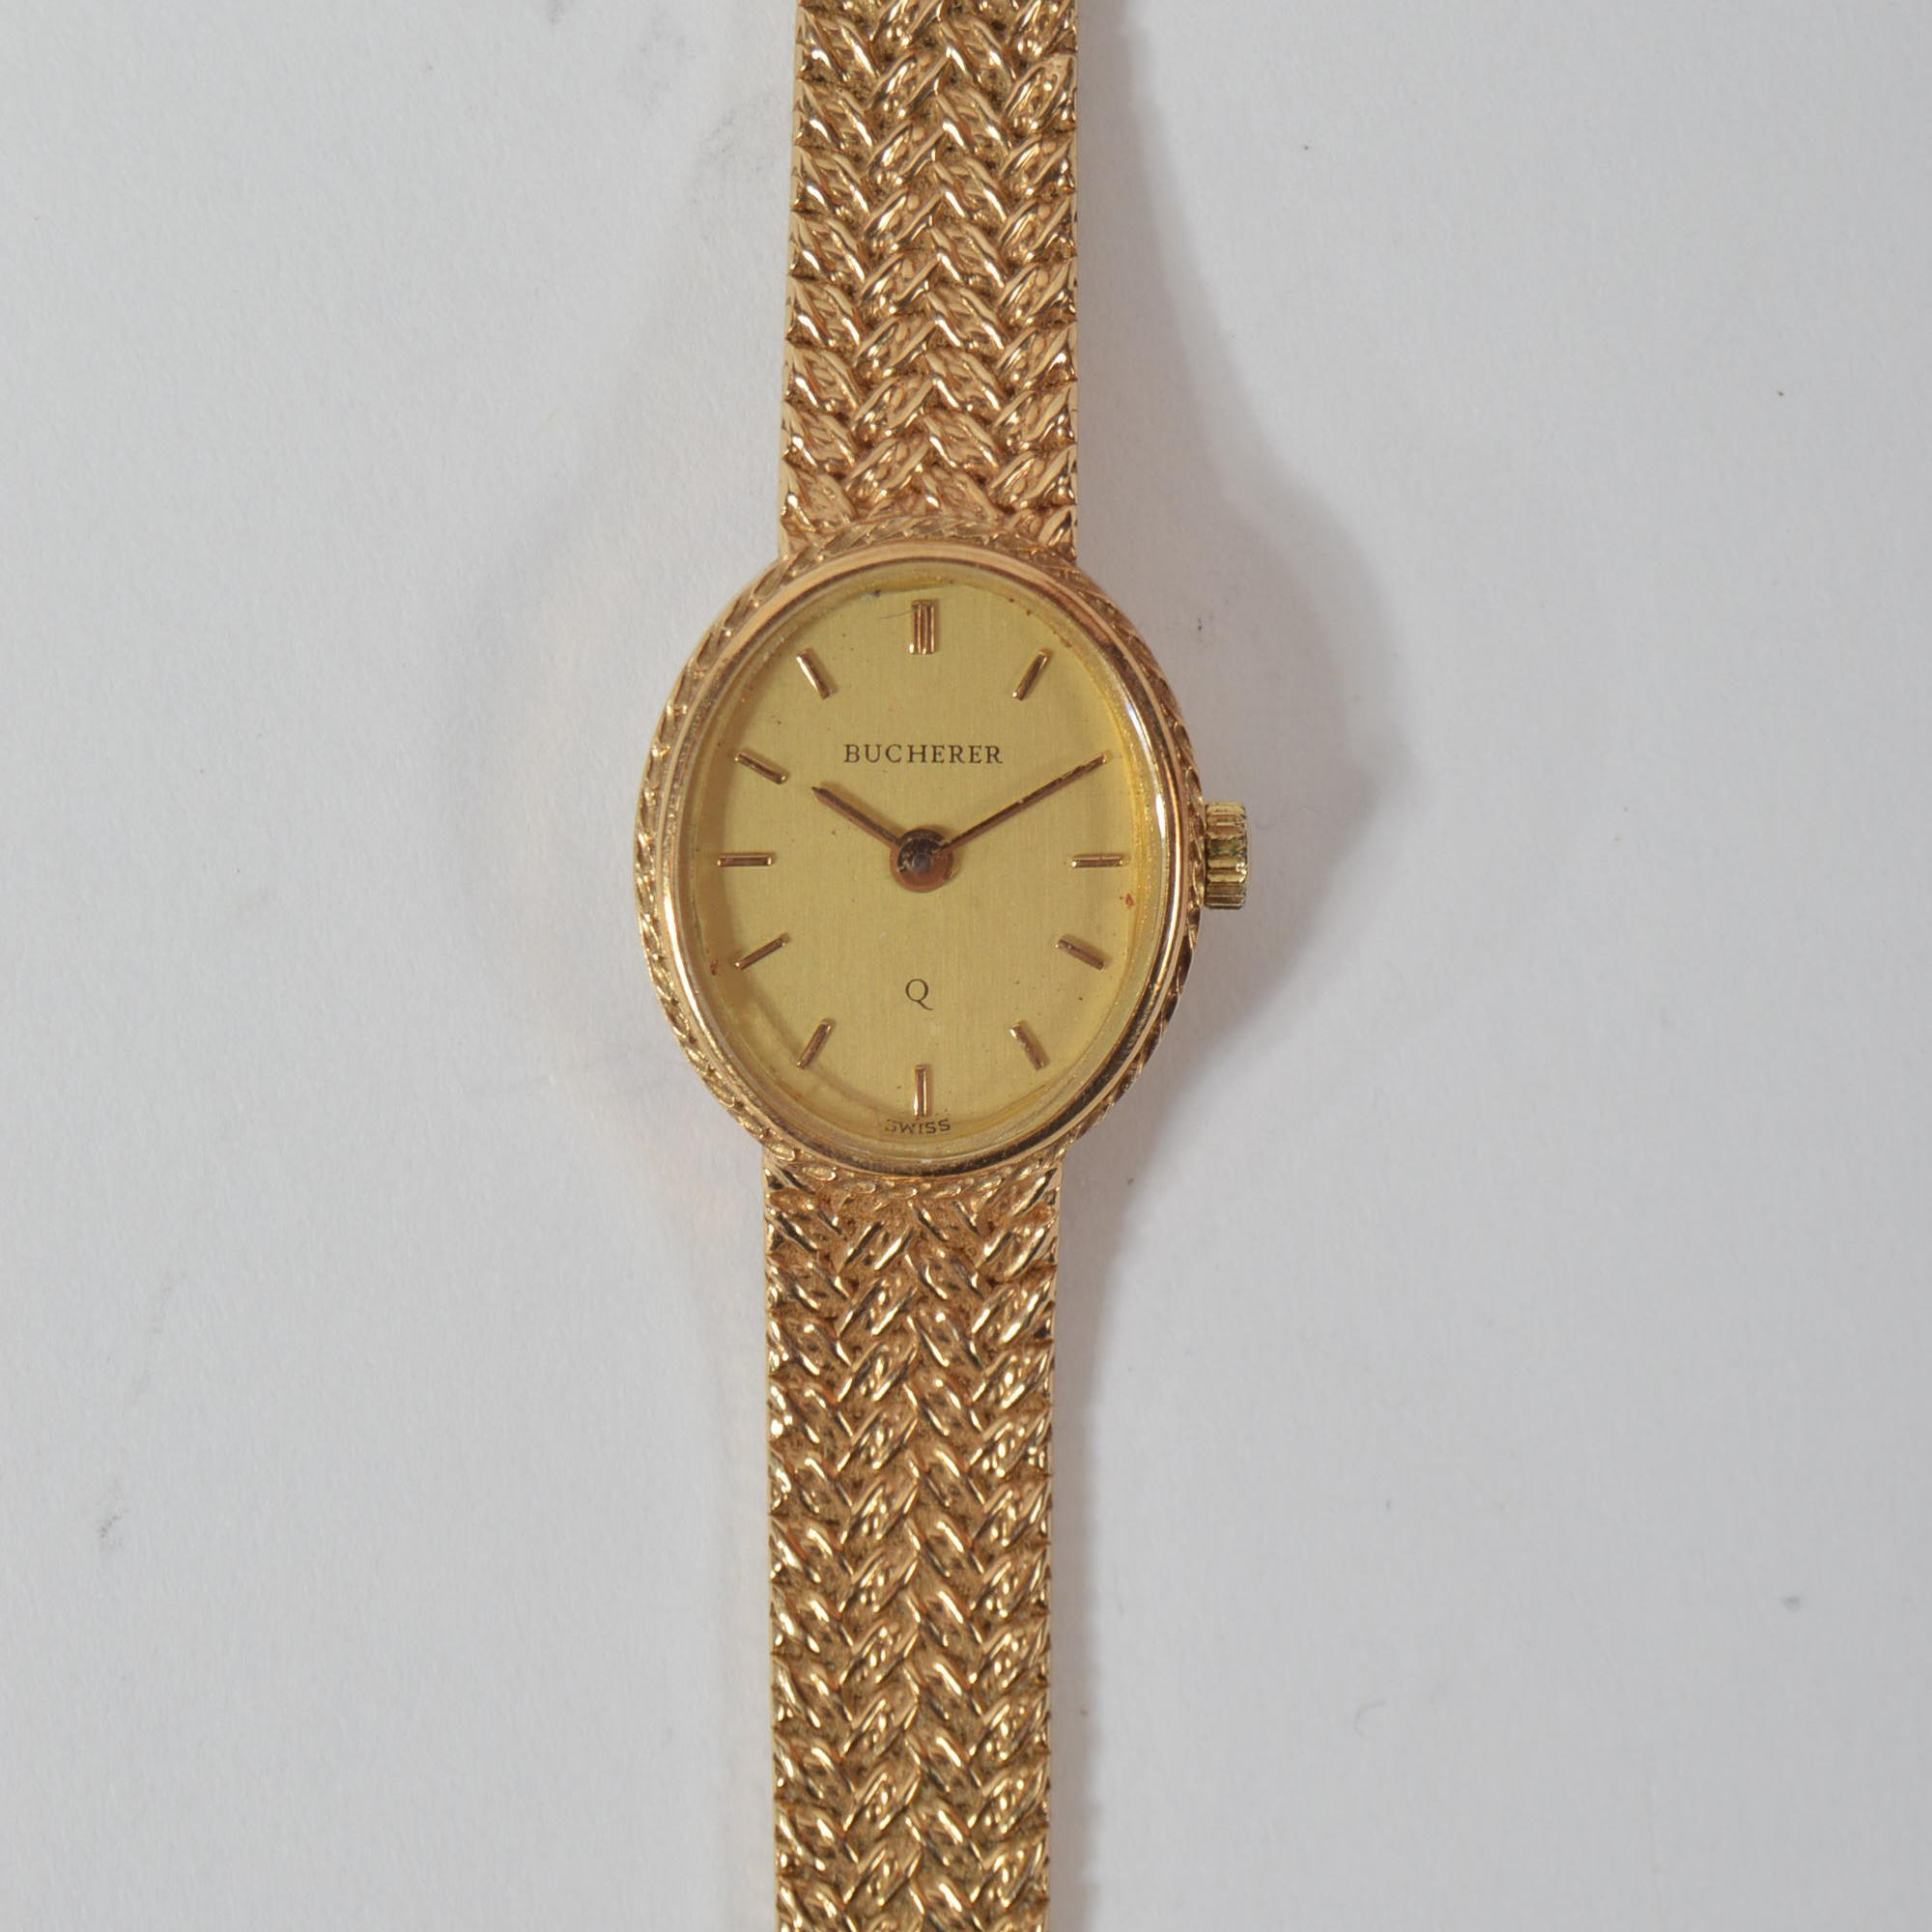 Ladies 14K Yellow Gold Bucherer Watch